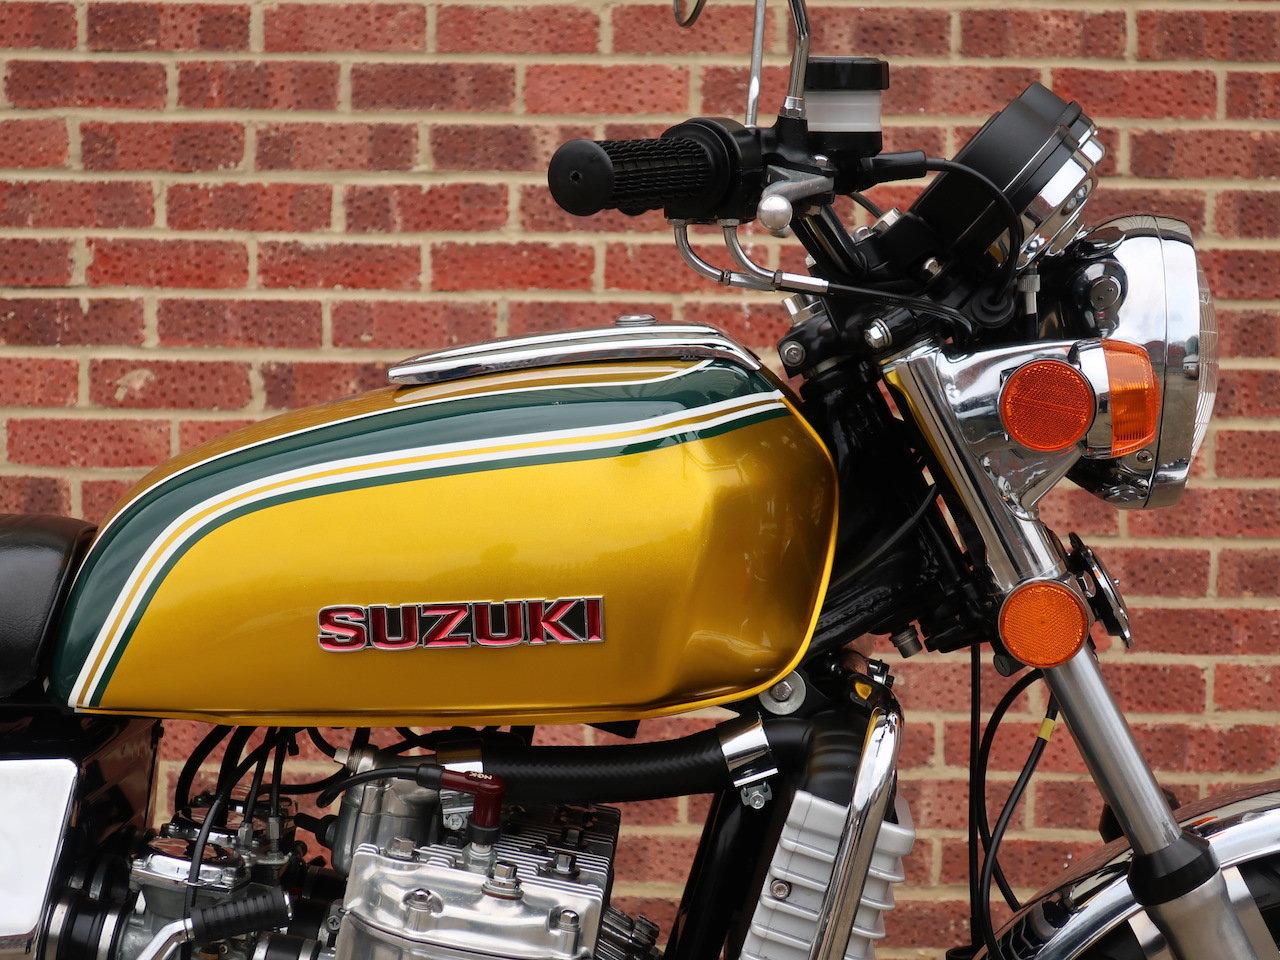 1976 Suzuki GT750 For Sale (picture 2 of 6)